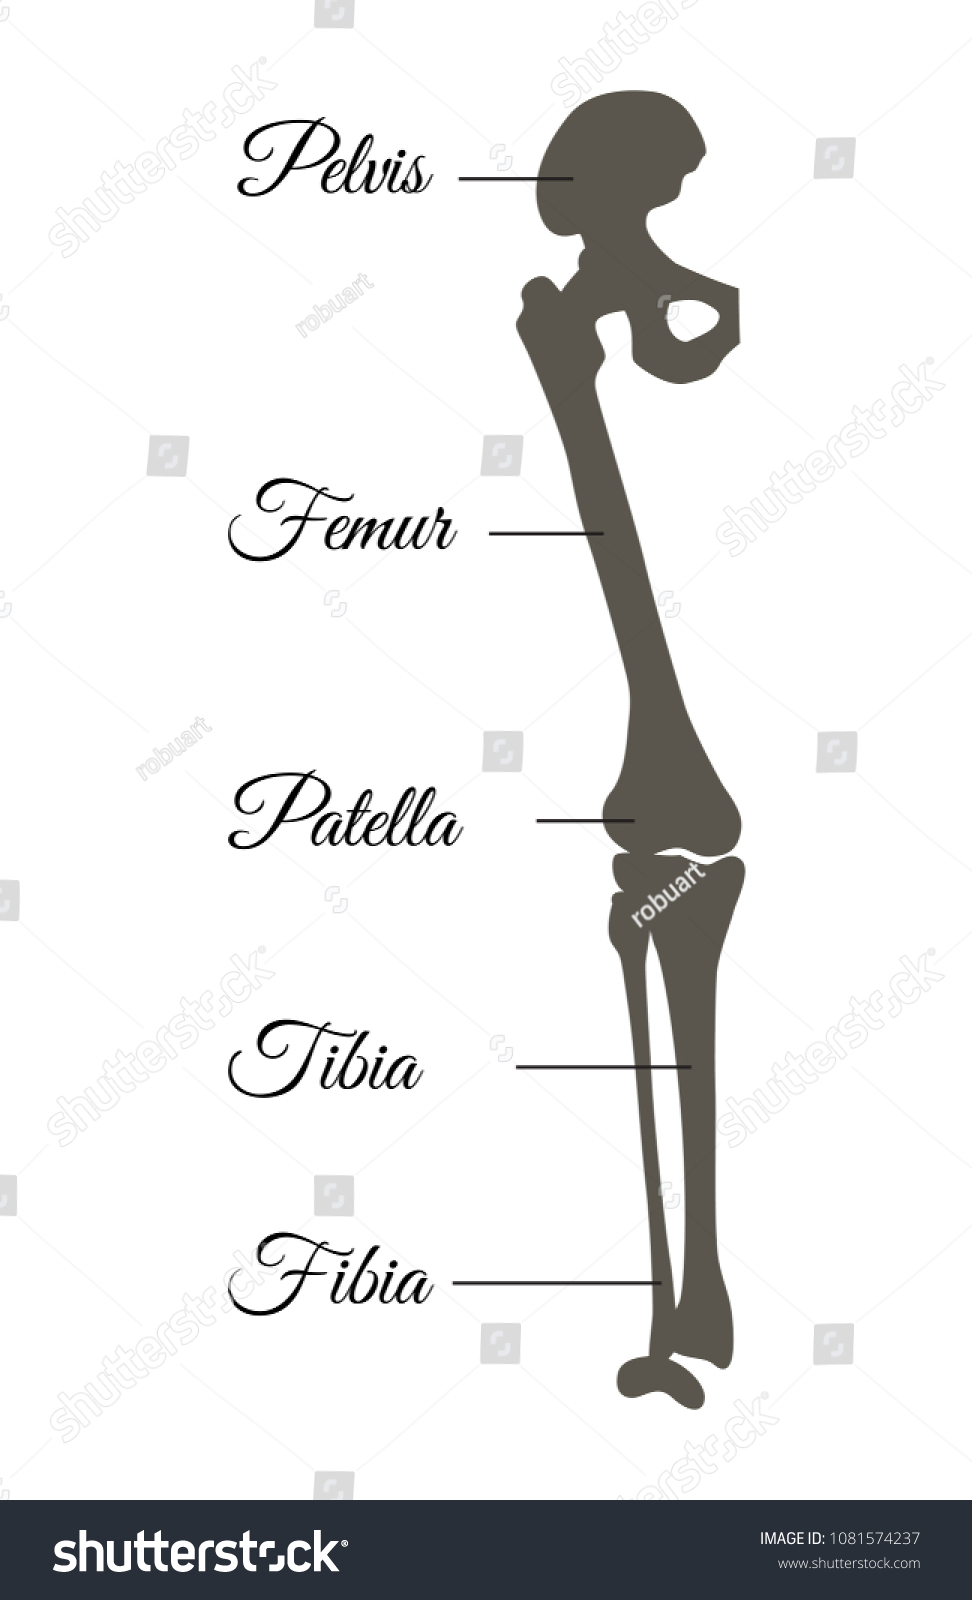 Pelvis Femur Patella Fibia Tibia Types Stock Vector Royalty Free